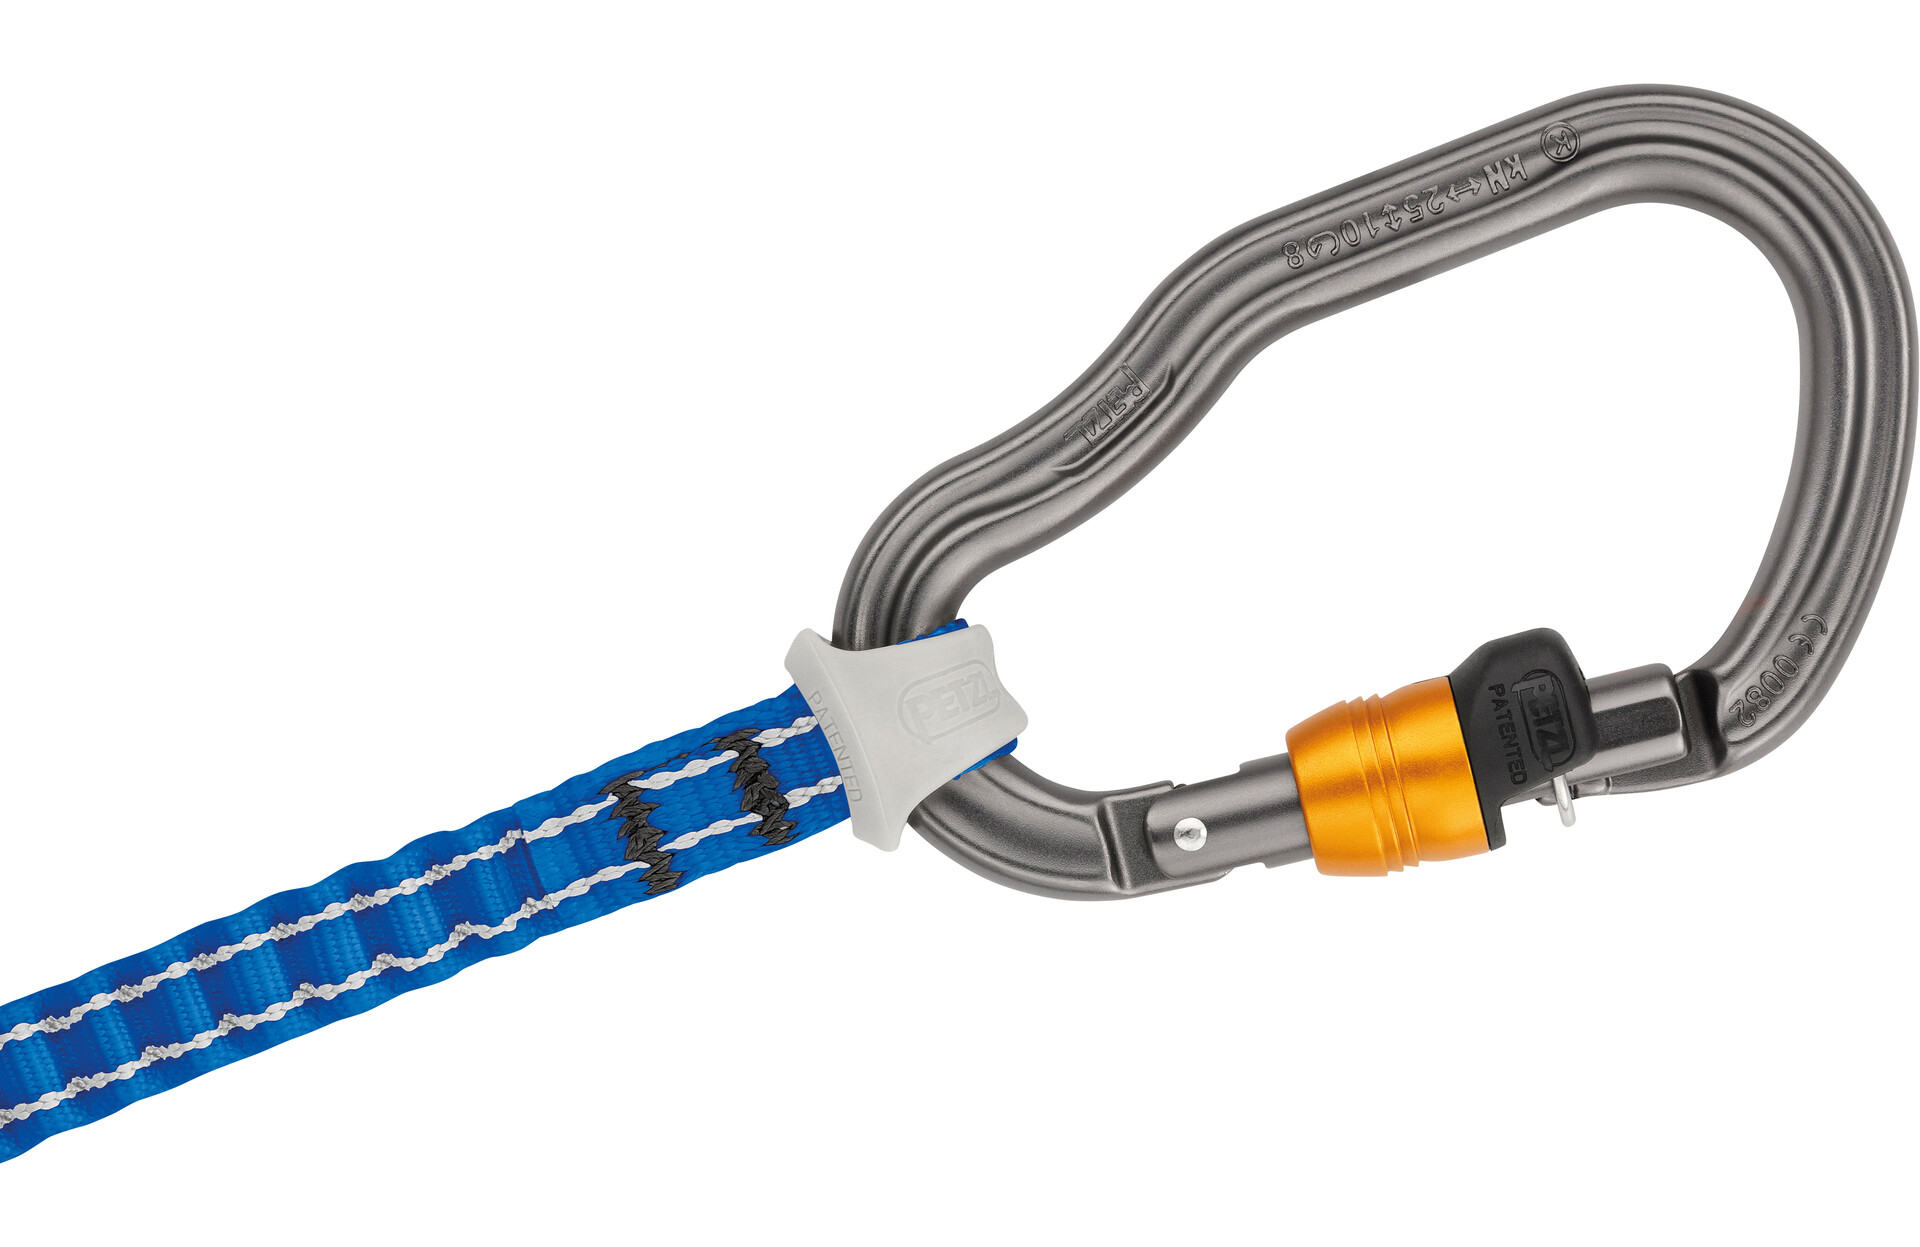 Klettersteigset Y Oder V : Petzl kit via ferrata vertigo klettersteig komplettset mit elios